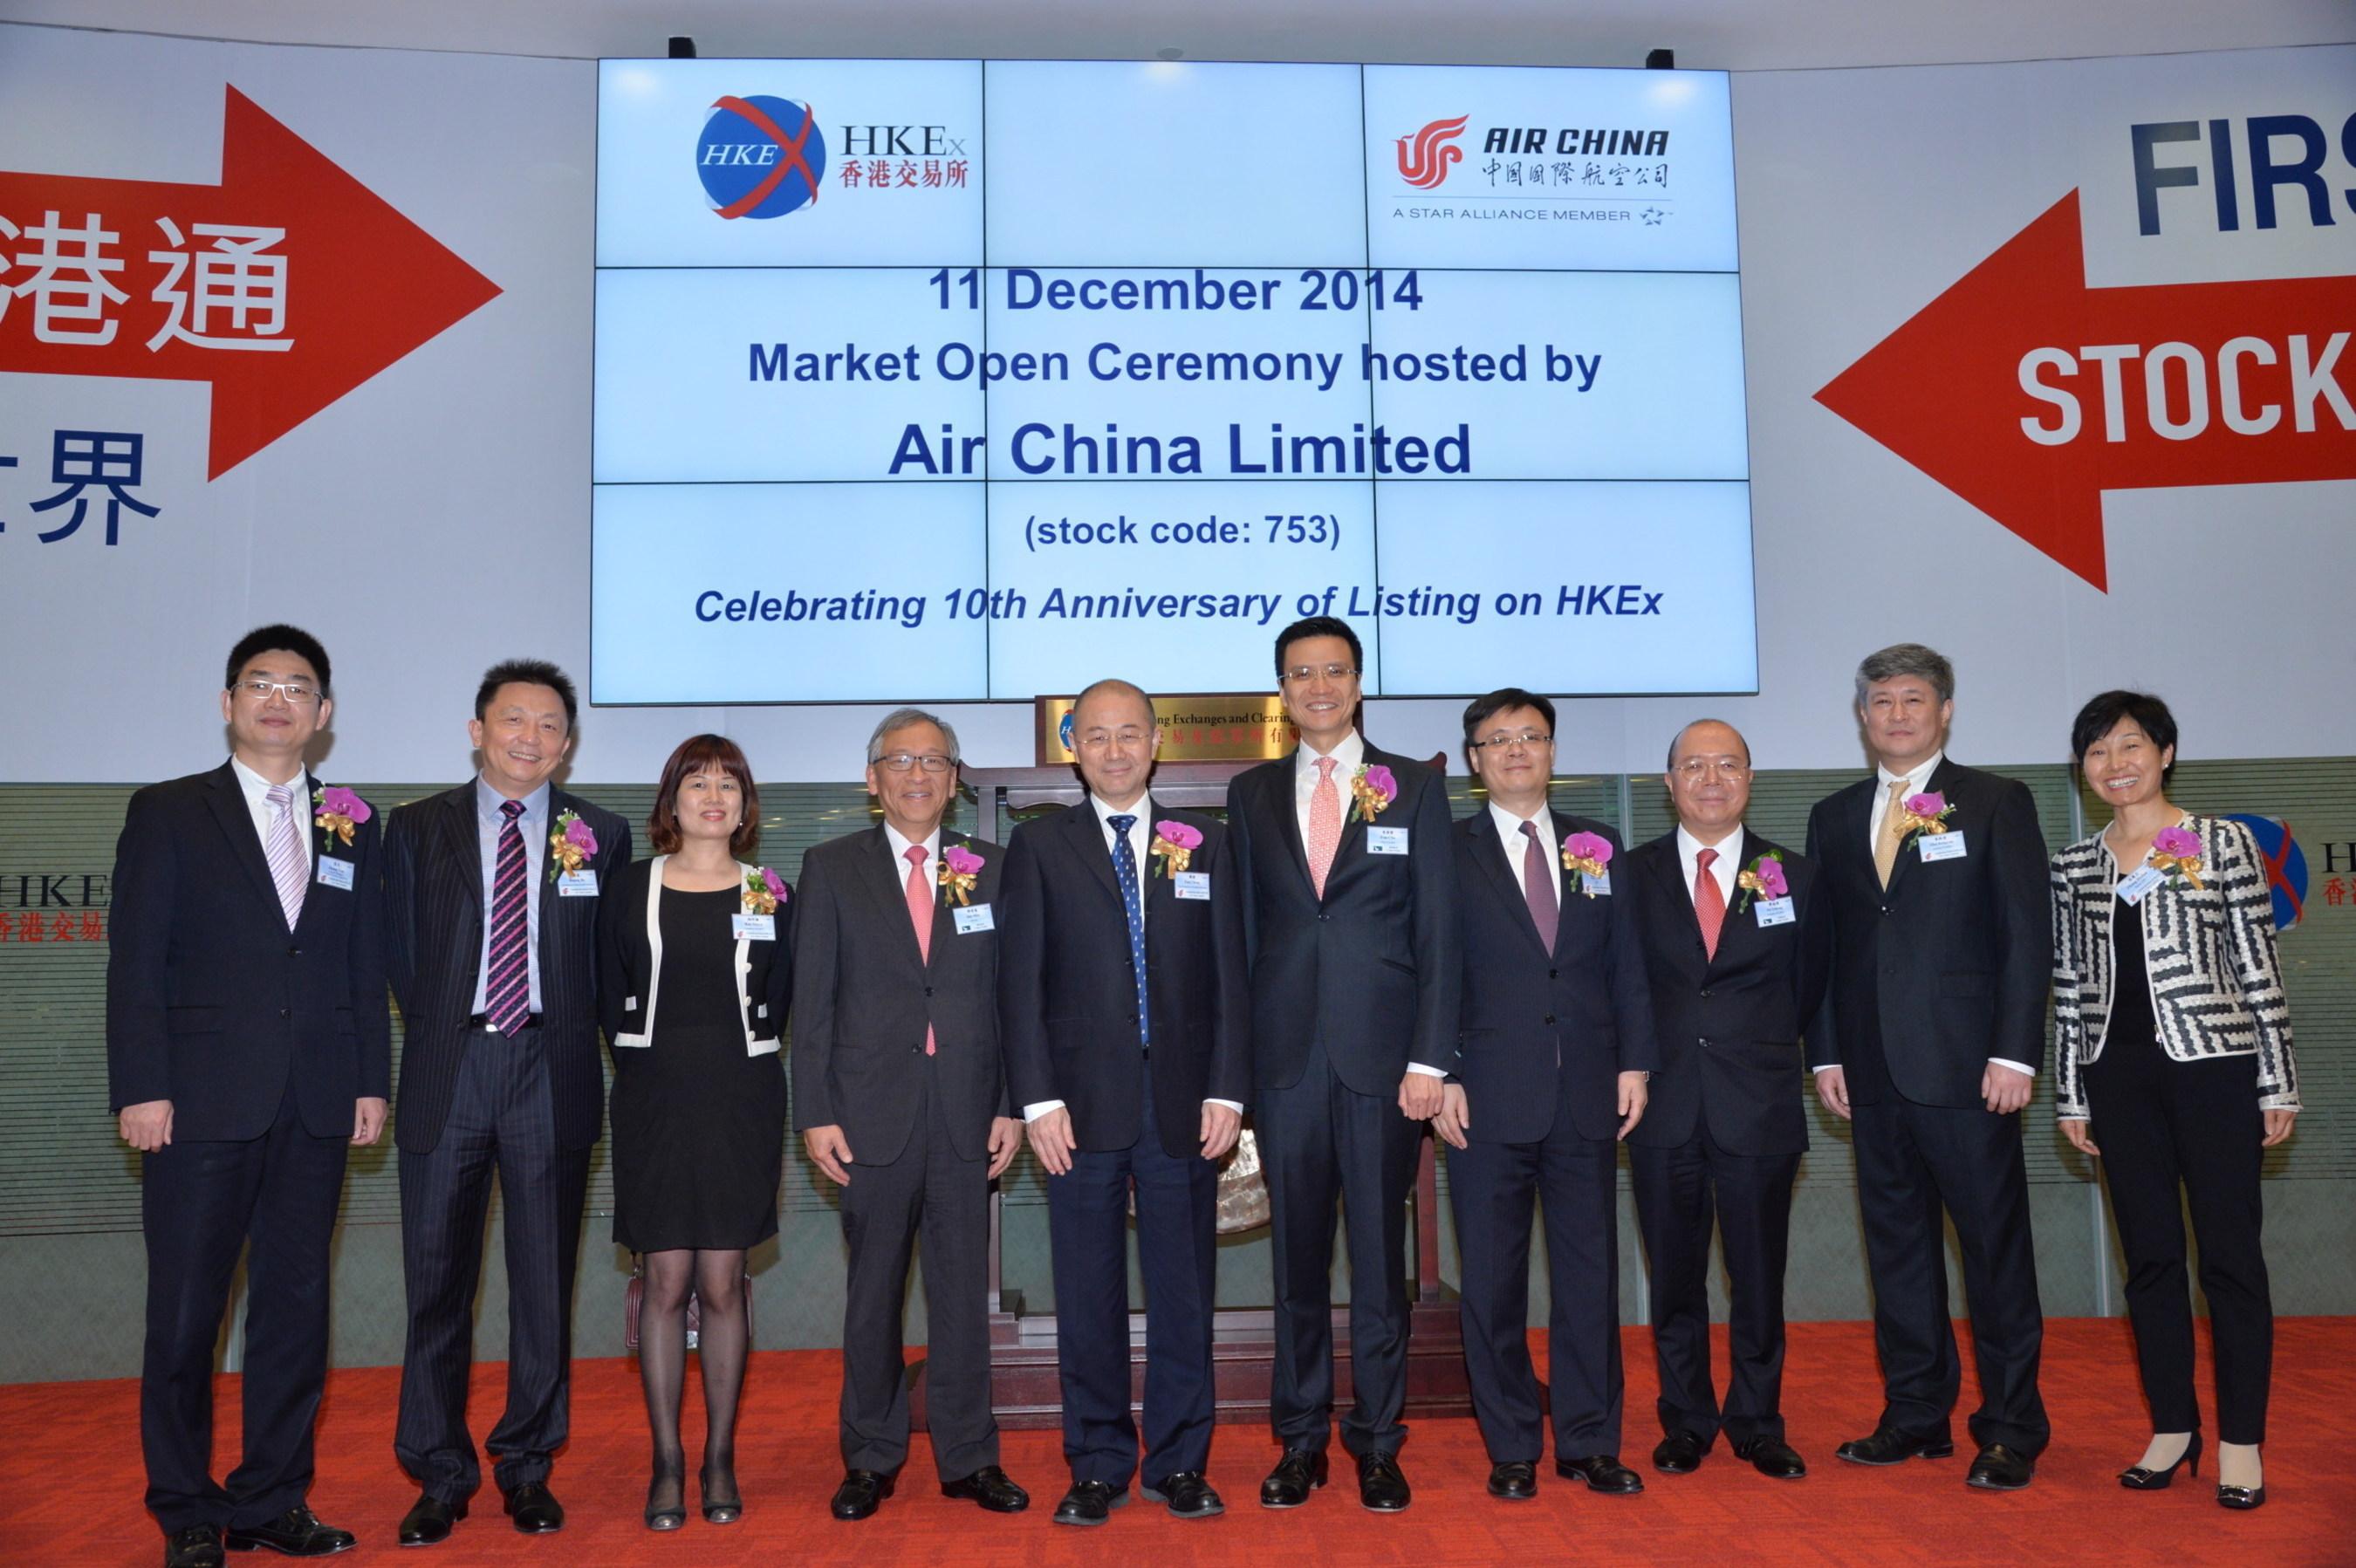 Air China zur Feier ihres zehnjährigen Börsenjubiläums in Hongkong Gastgeber der